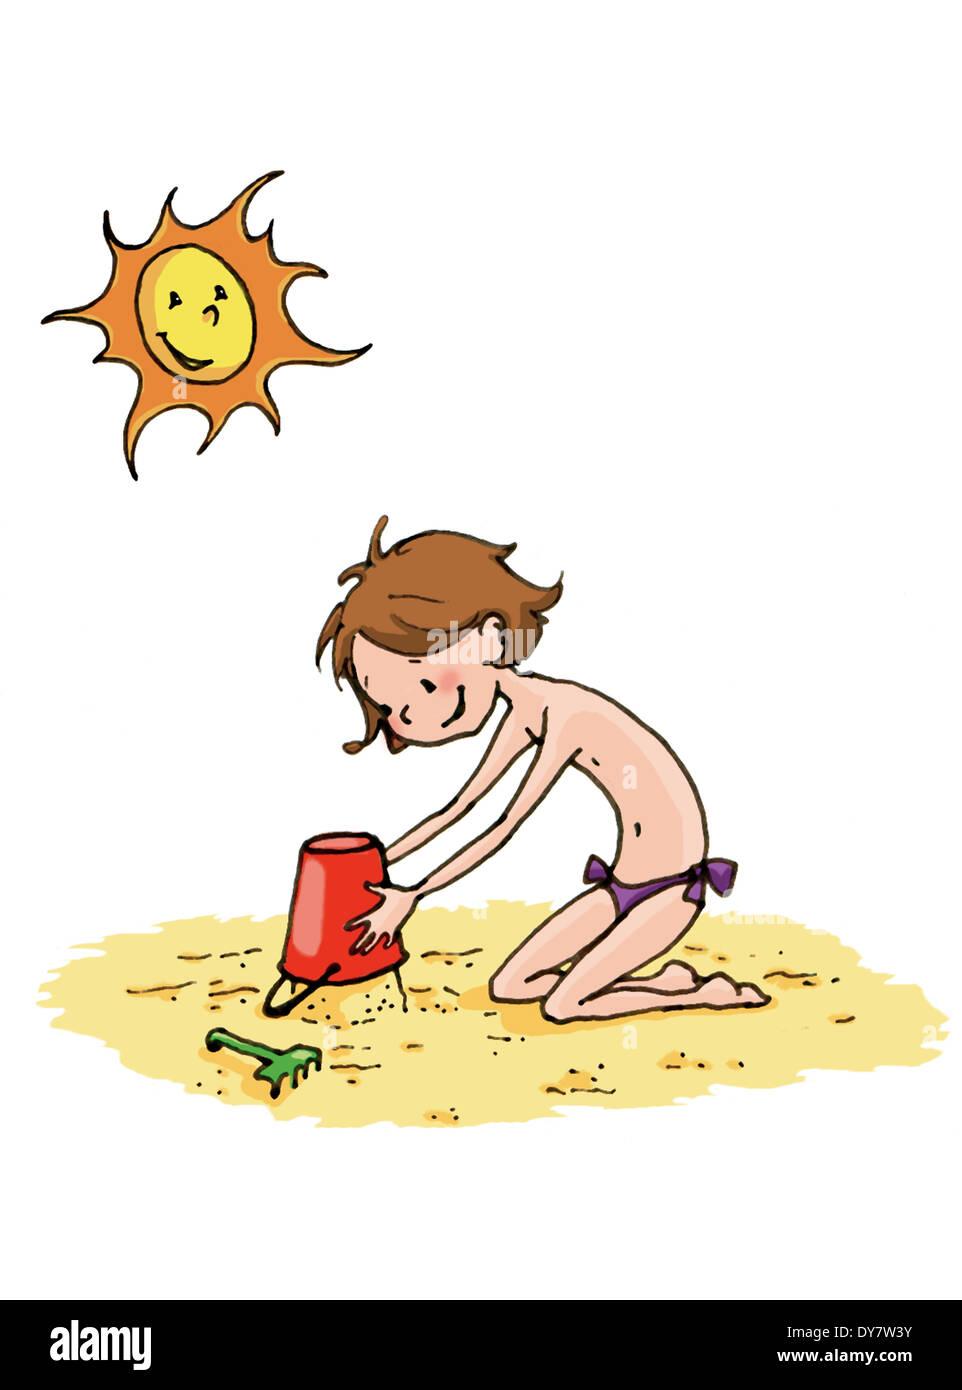 Sunburn - Stock Image